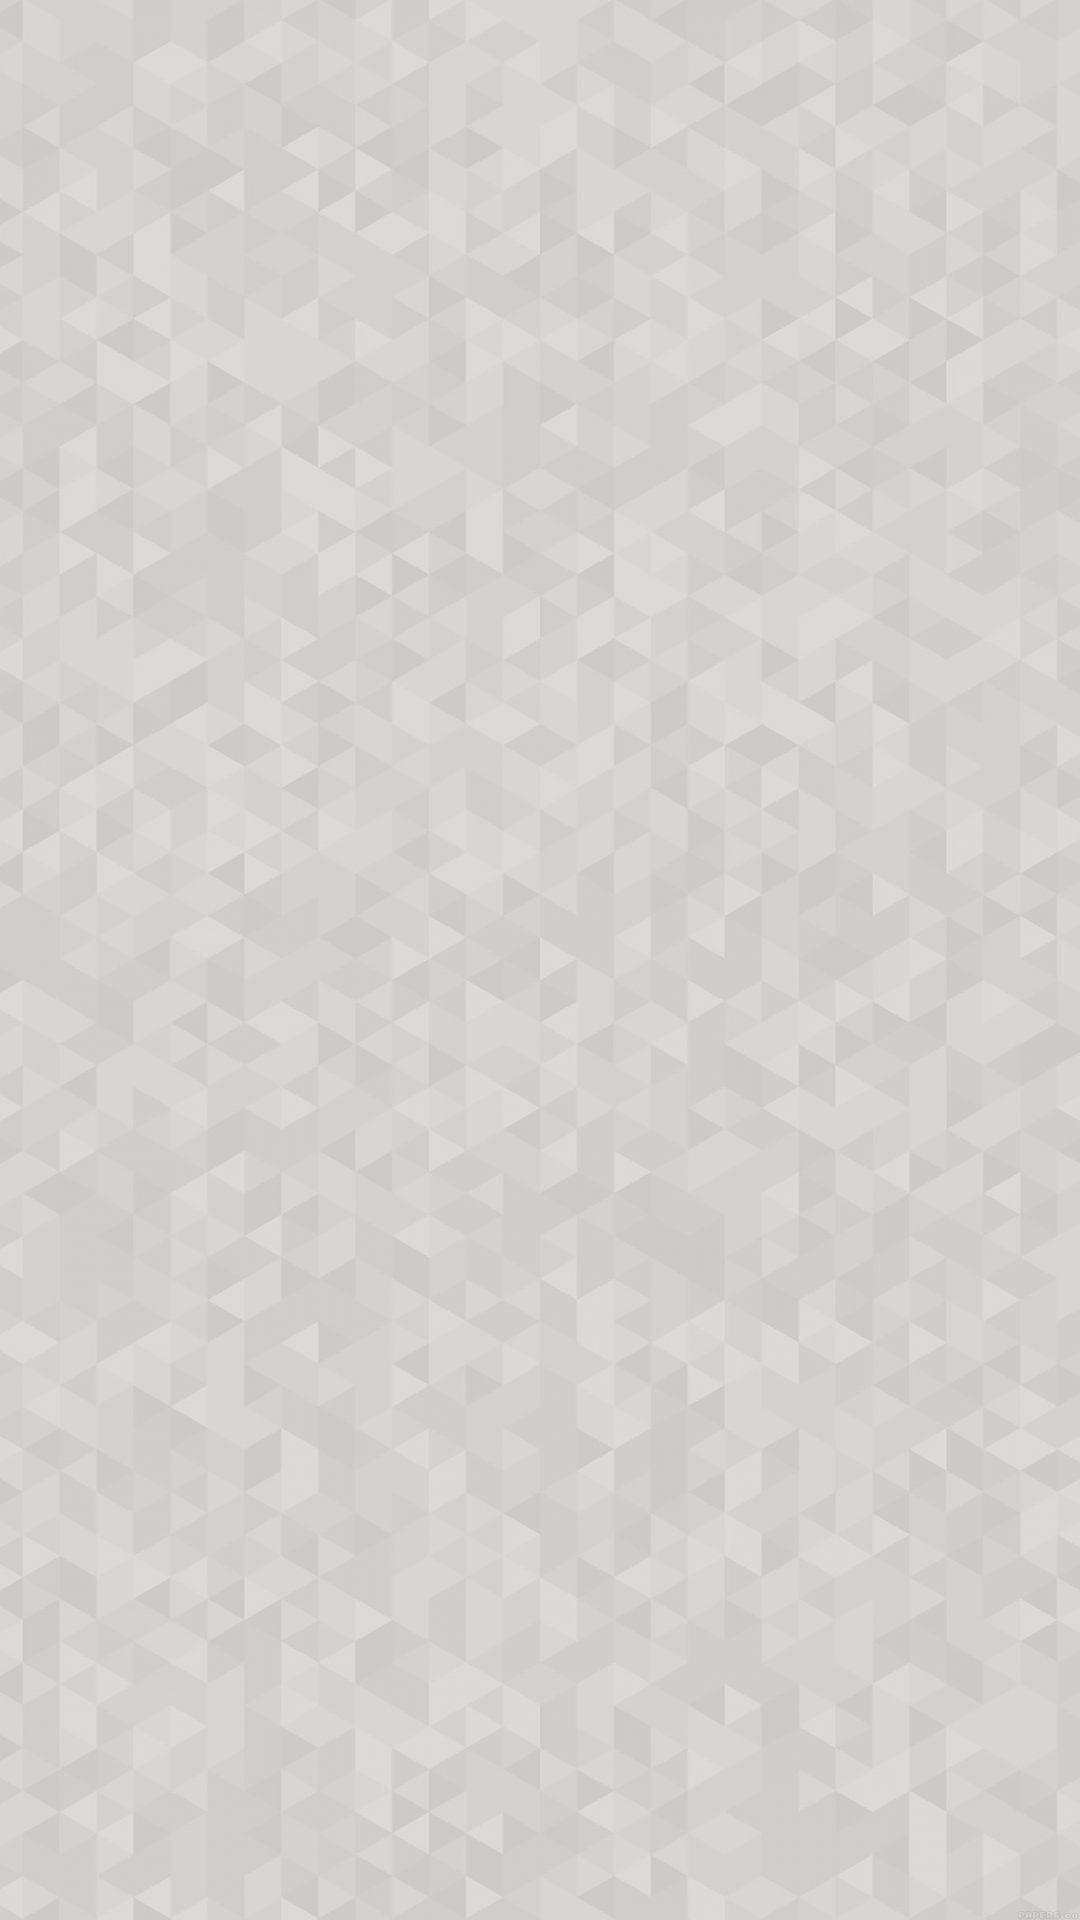 Diamonds Abstract Art White Pattern